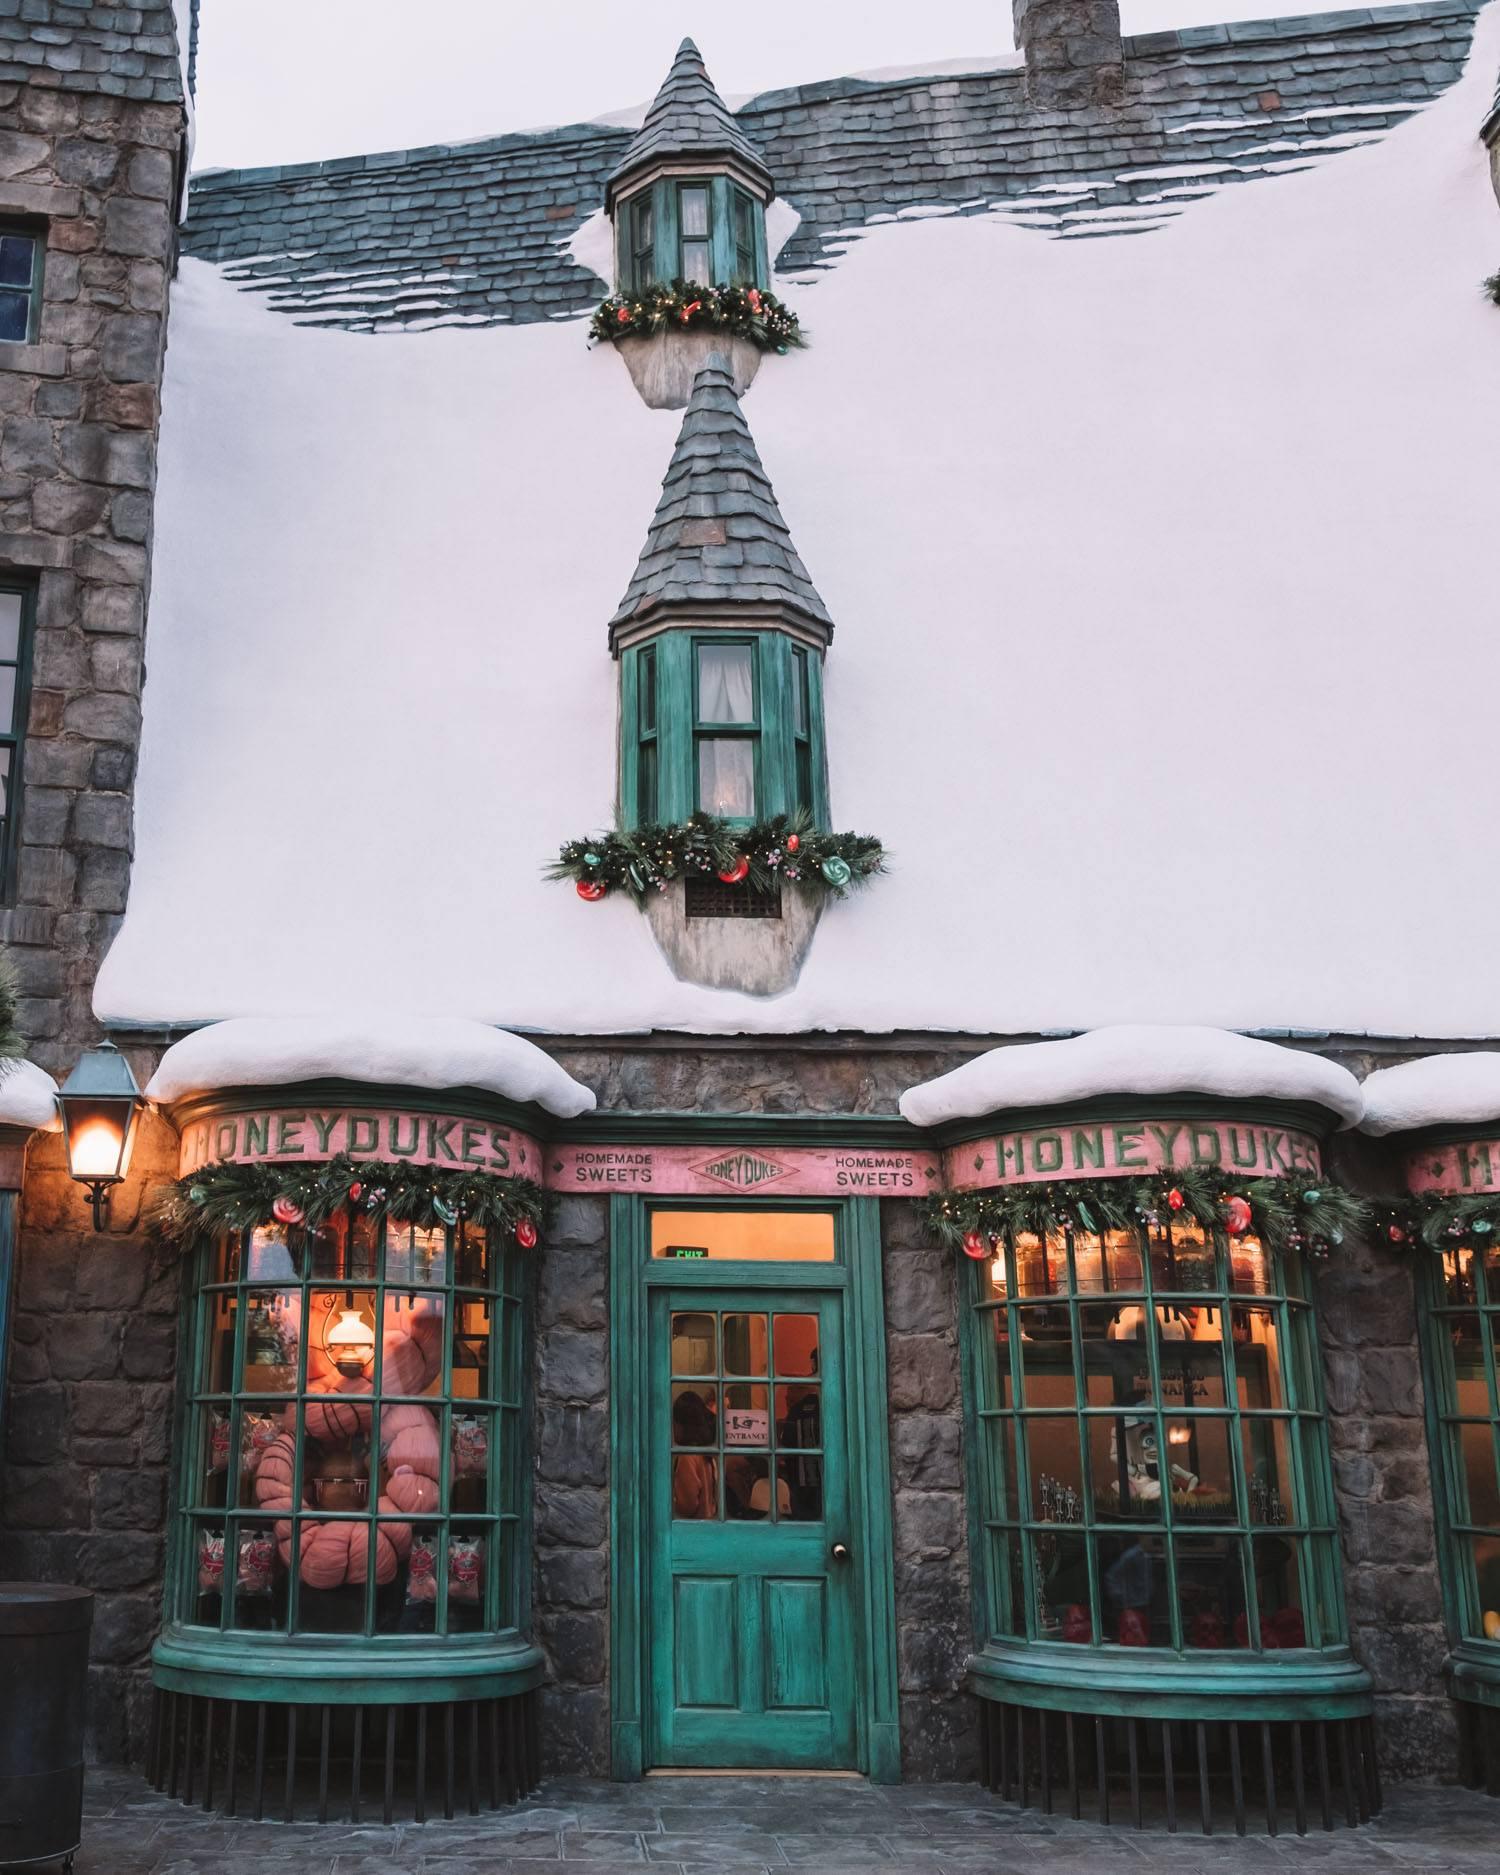 Honeydukes Wizarding World of Harry Potter